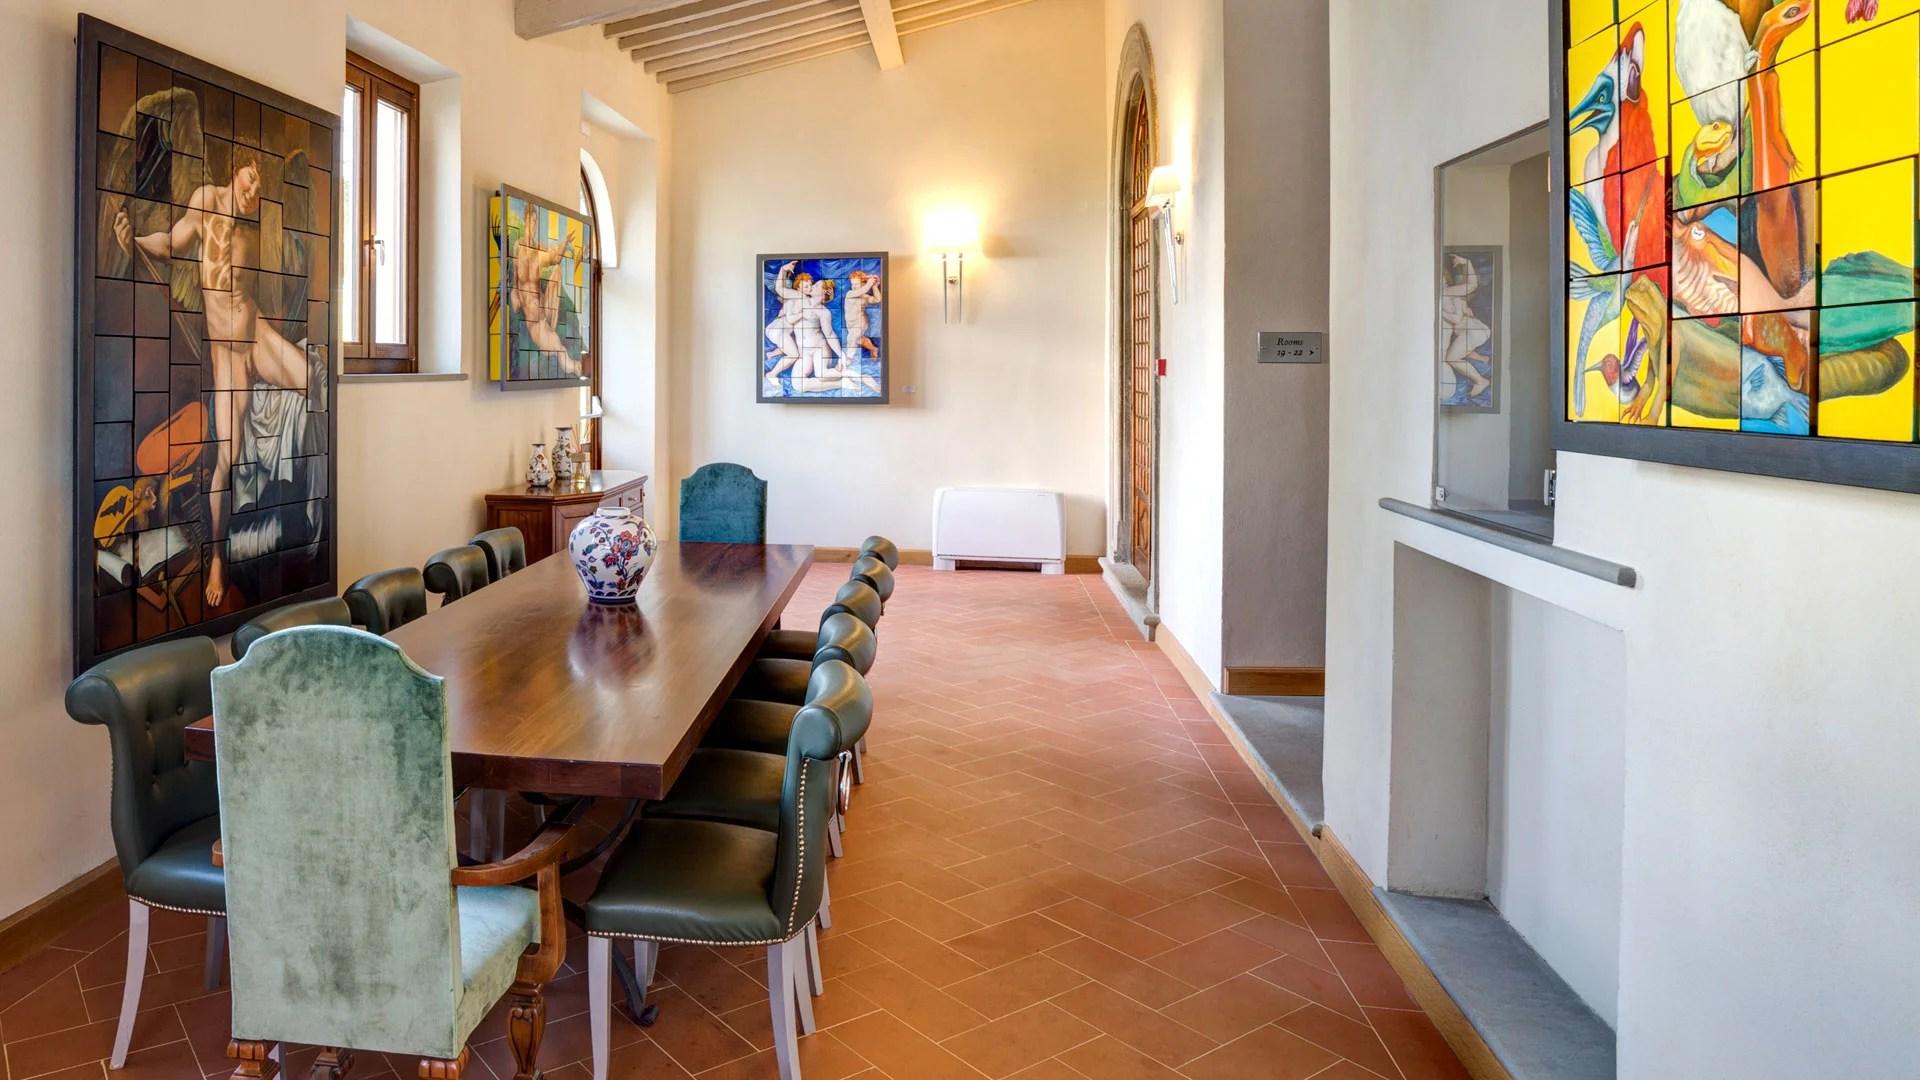 Cene aziendali - Villa Tolomei Hotel & Resort 5 stelle